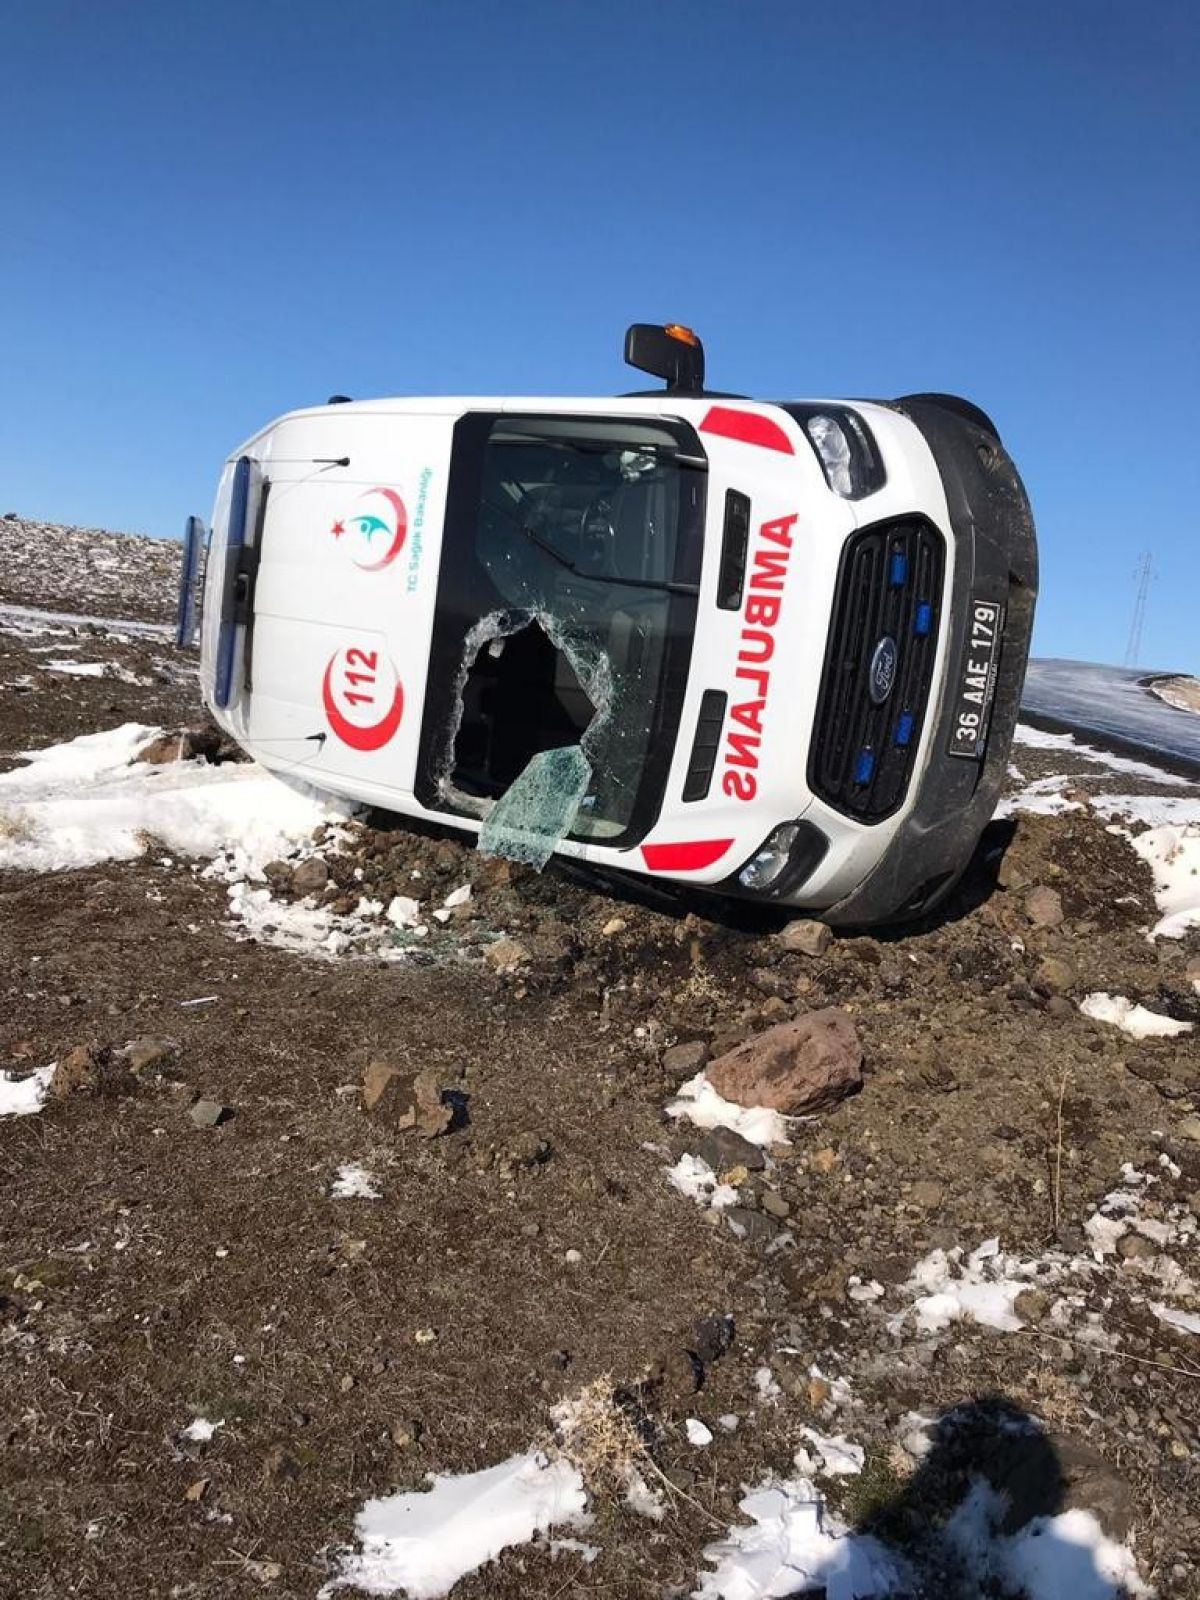 Kars'ta hasta almaya giden ambulans takla attı: 3 yaralı #1